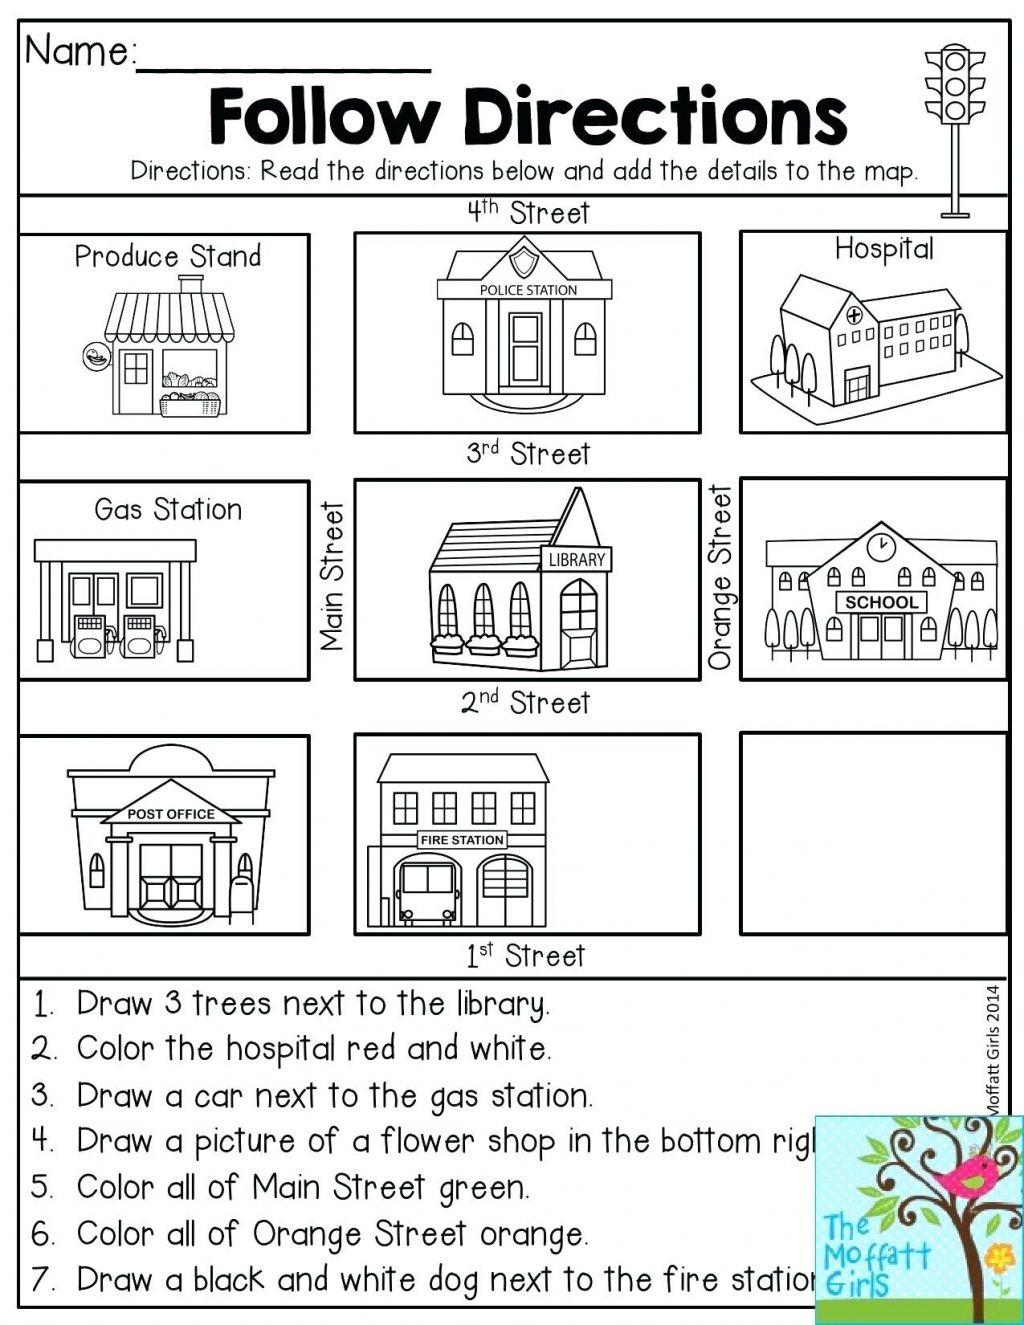 Map Scale Worksheet 3rd Grade 6 Map Scale Worksheets 3rd Grade Worksheets